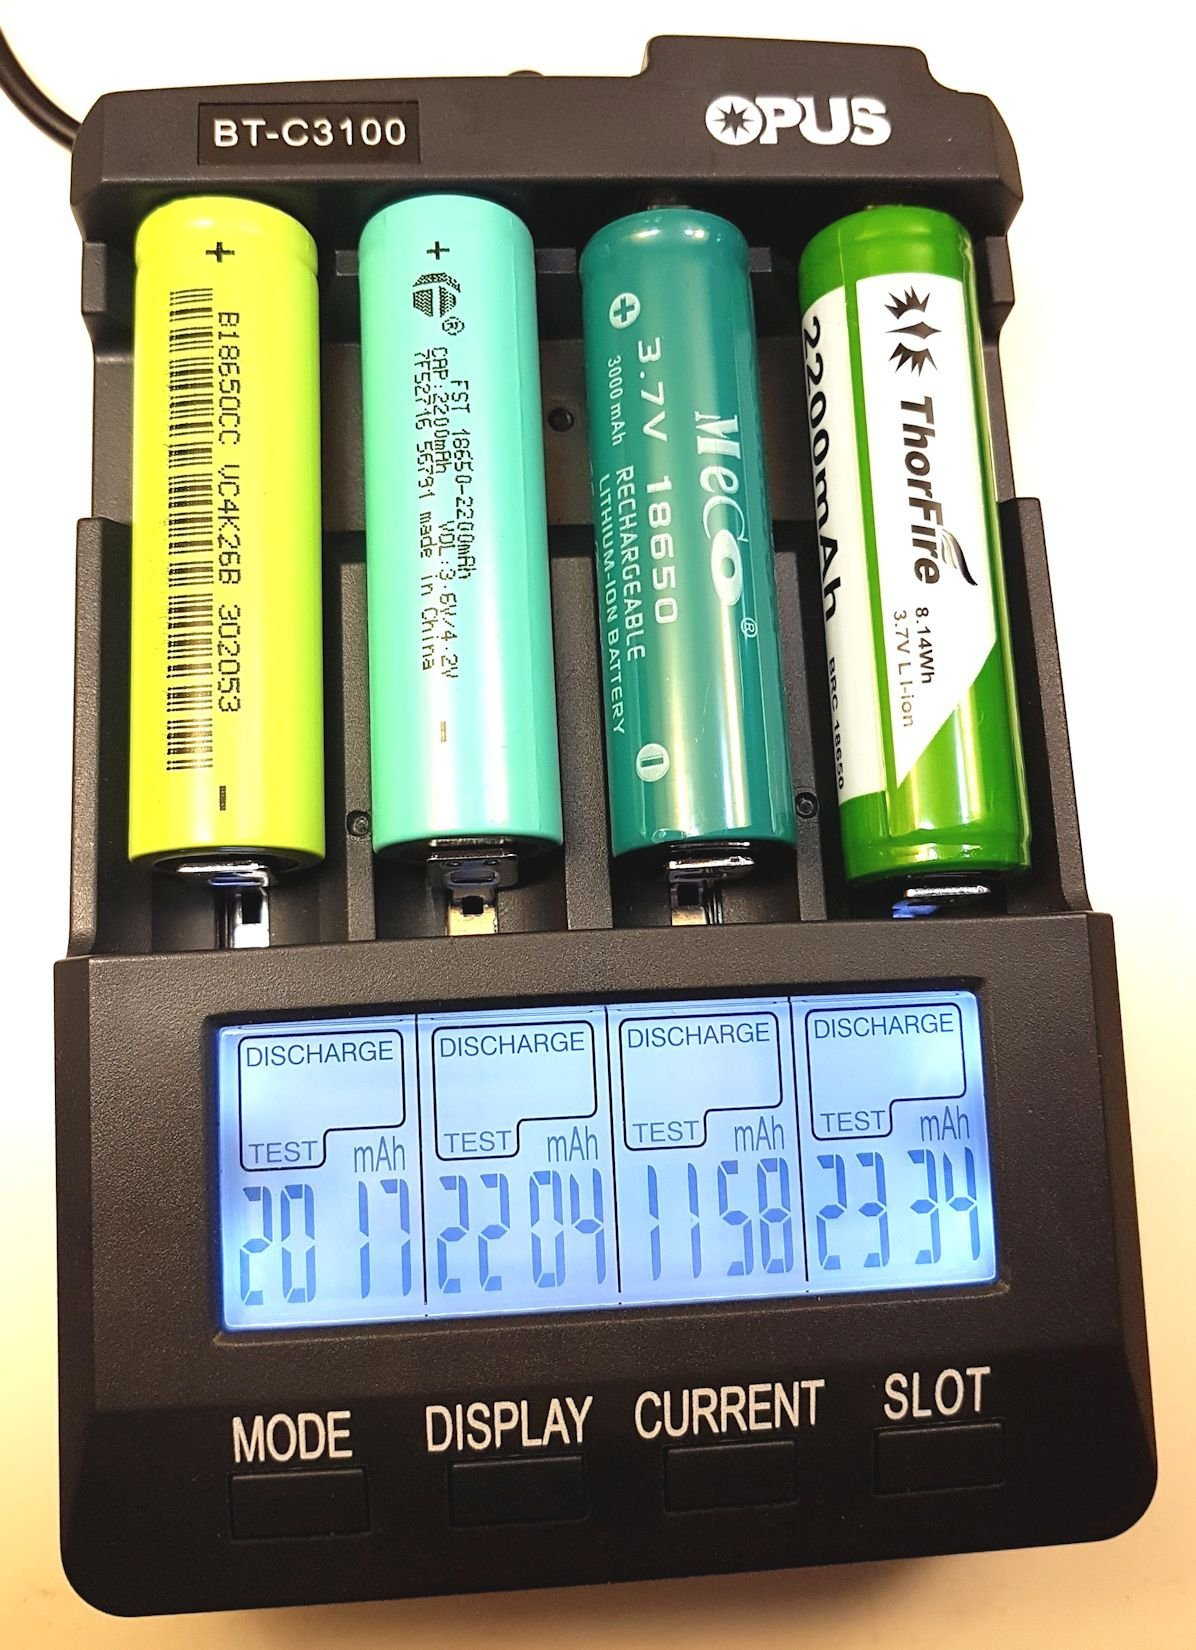 opus-bt-c3100-v2_2-li-ion-18650-aksi-akkumulator-teszt-kicsi3.jpg